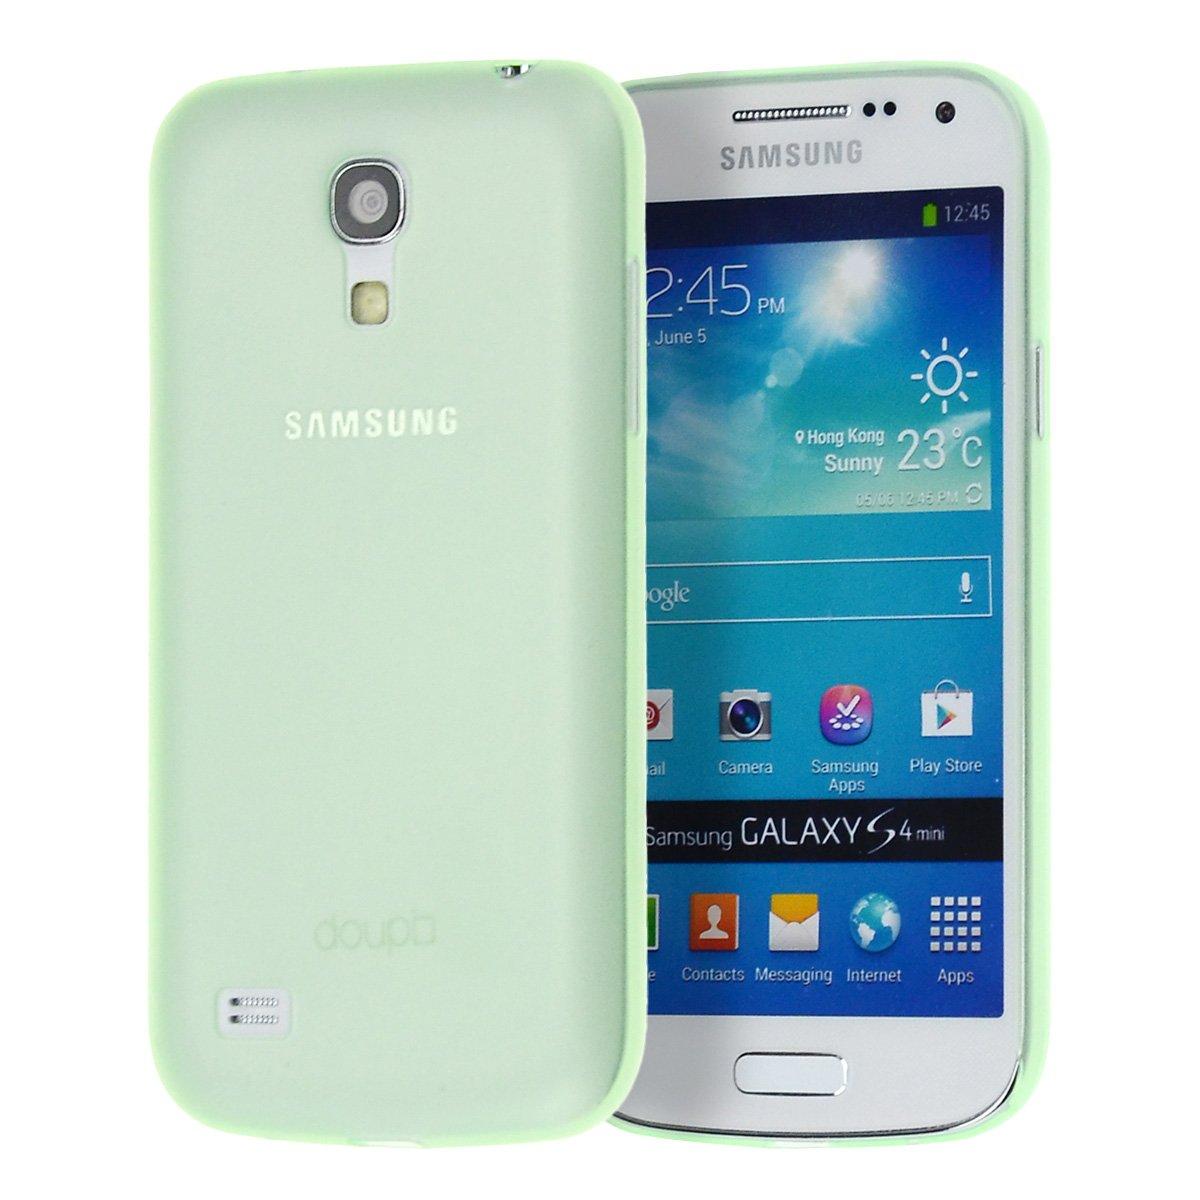 doupi UltraSlim Case Samsung Galaxy S4 mini Fine Matte Feather Light Bumper Protector Sleeve Skin Cover - Green